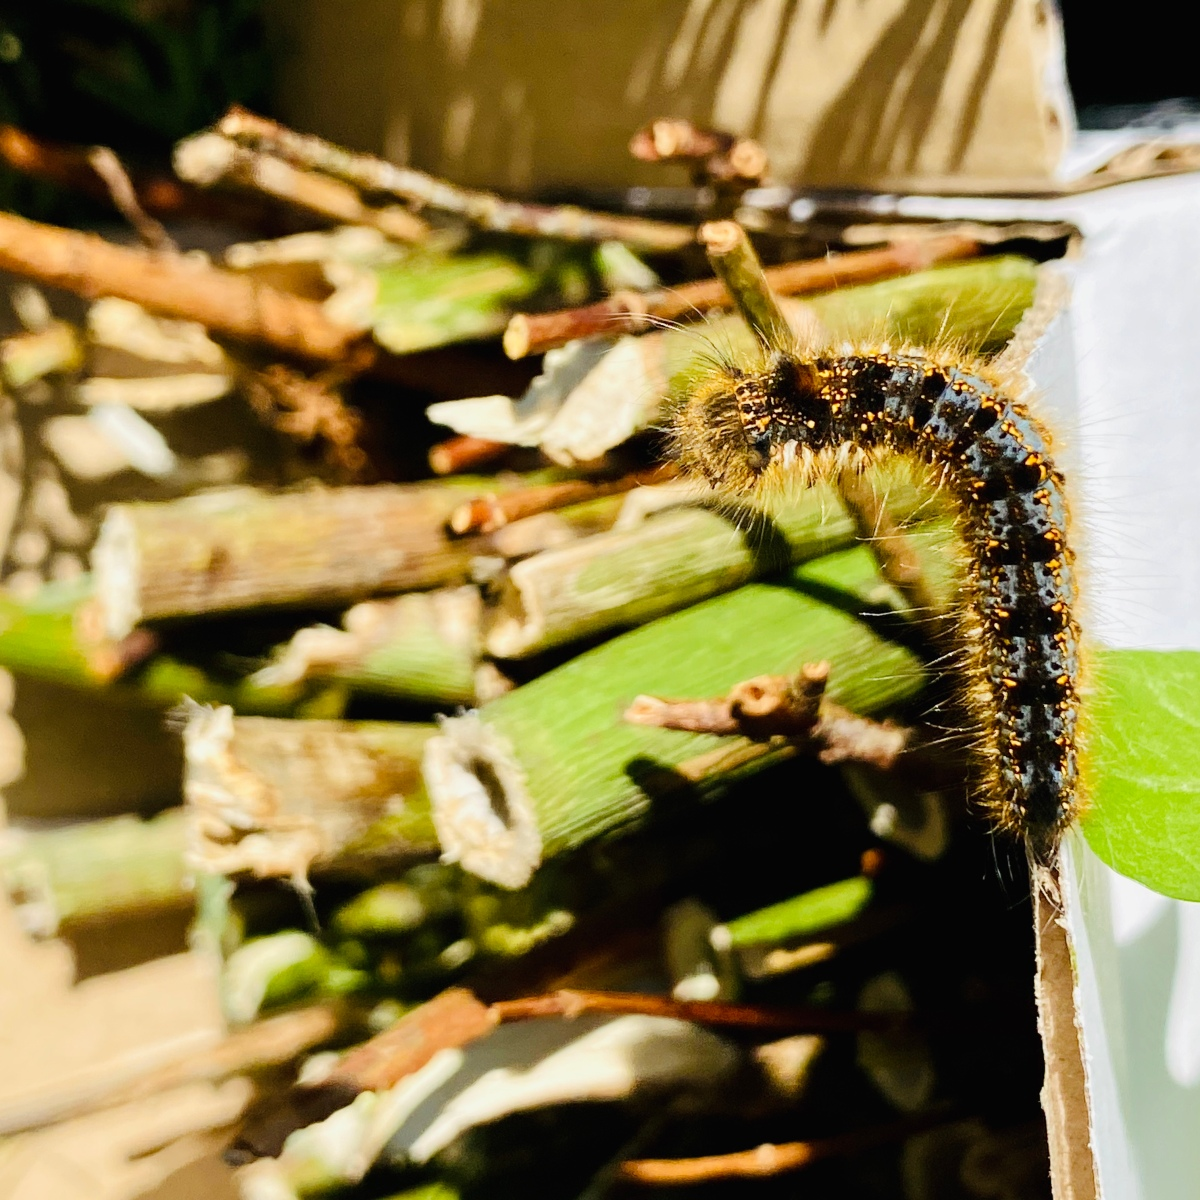 Caterpillar crawling into a bug hotel